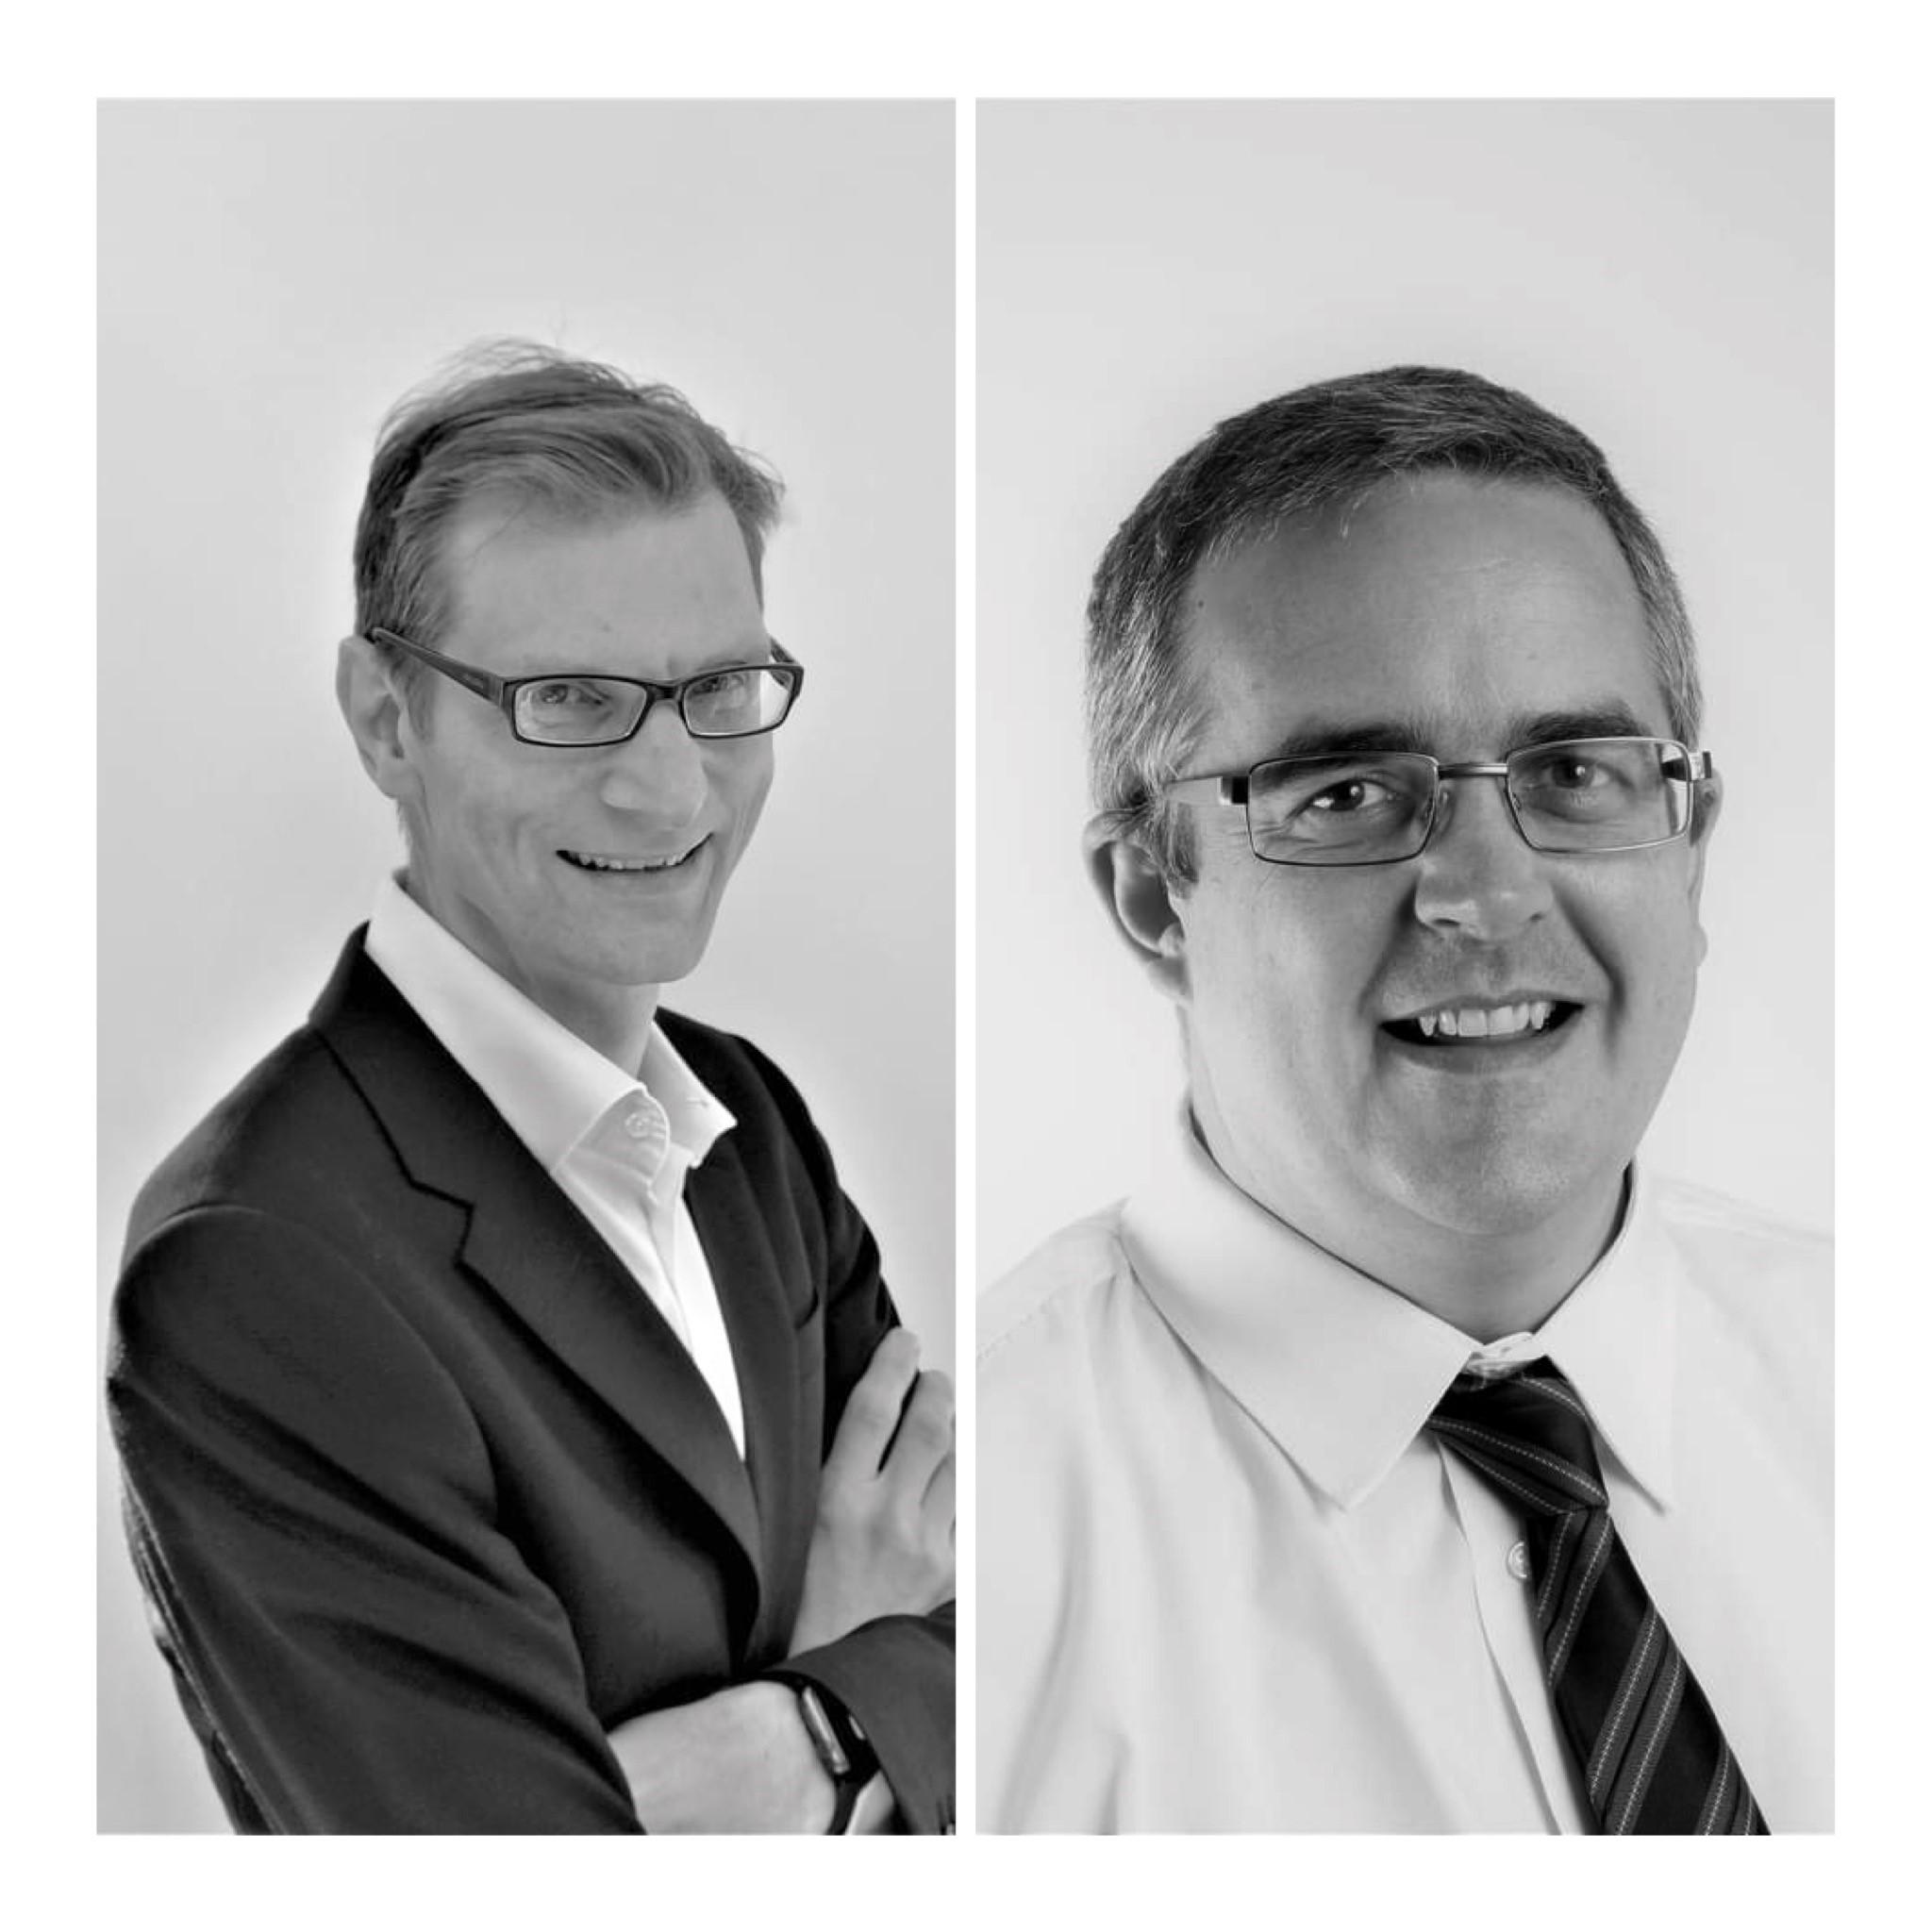 Brindley Twist Tafft & James Announces New Partners